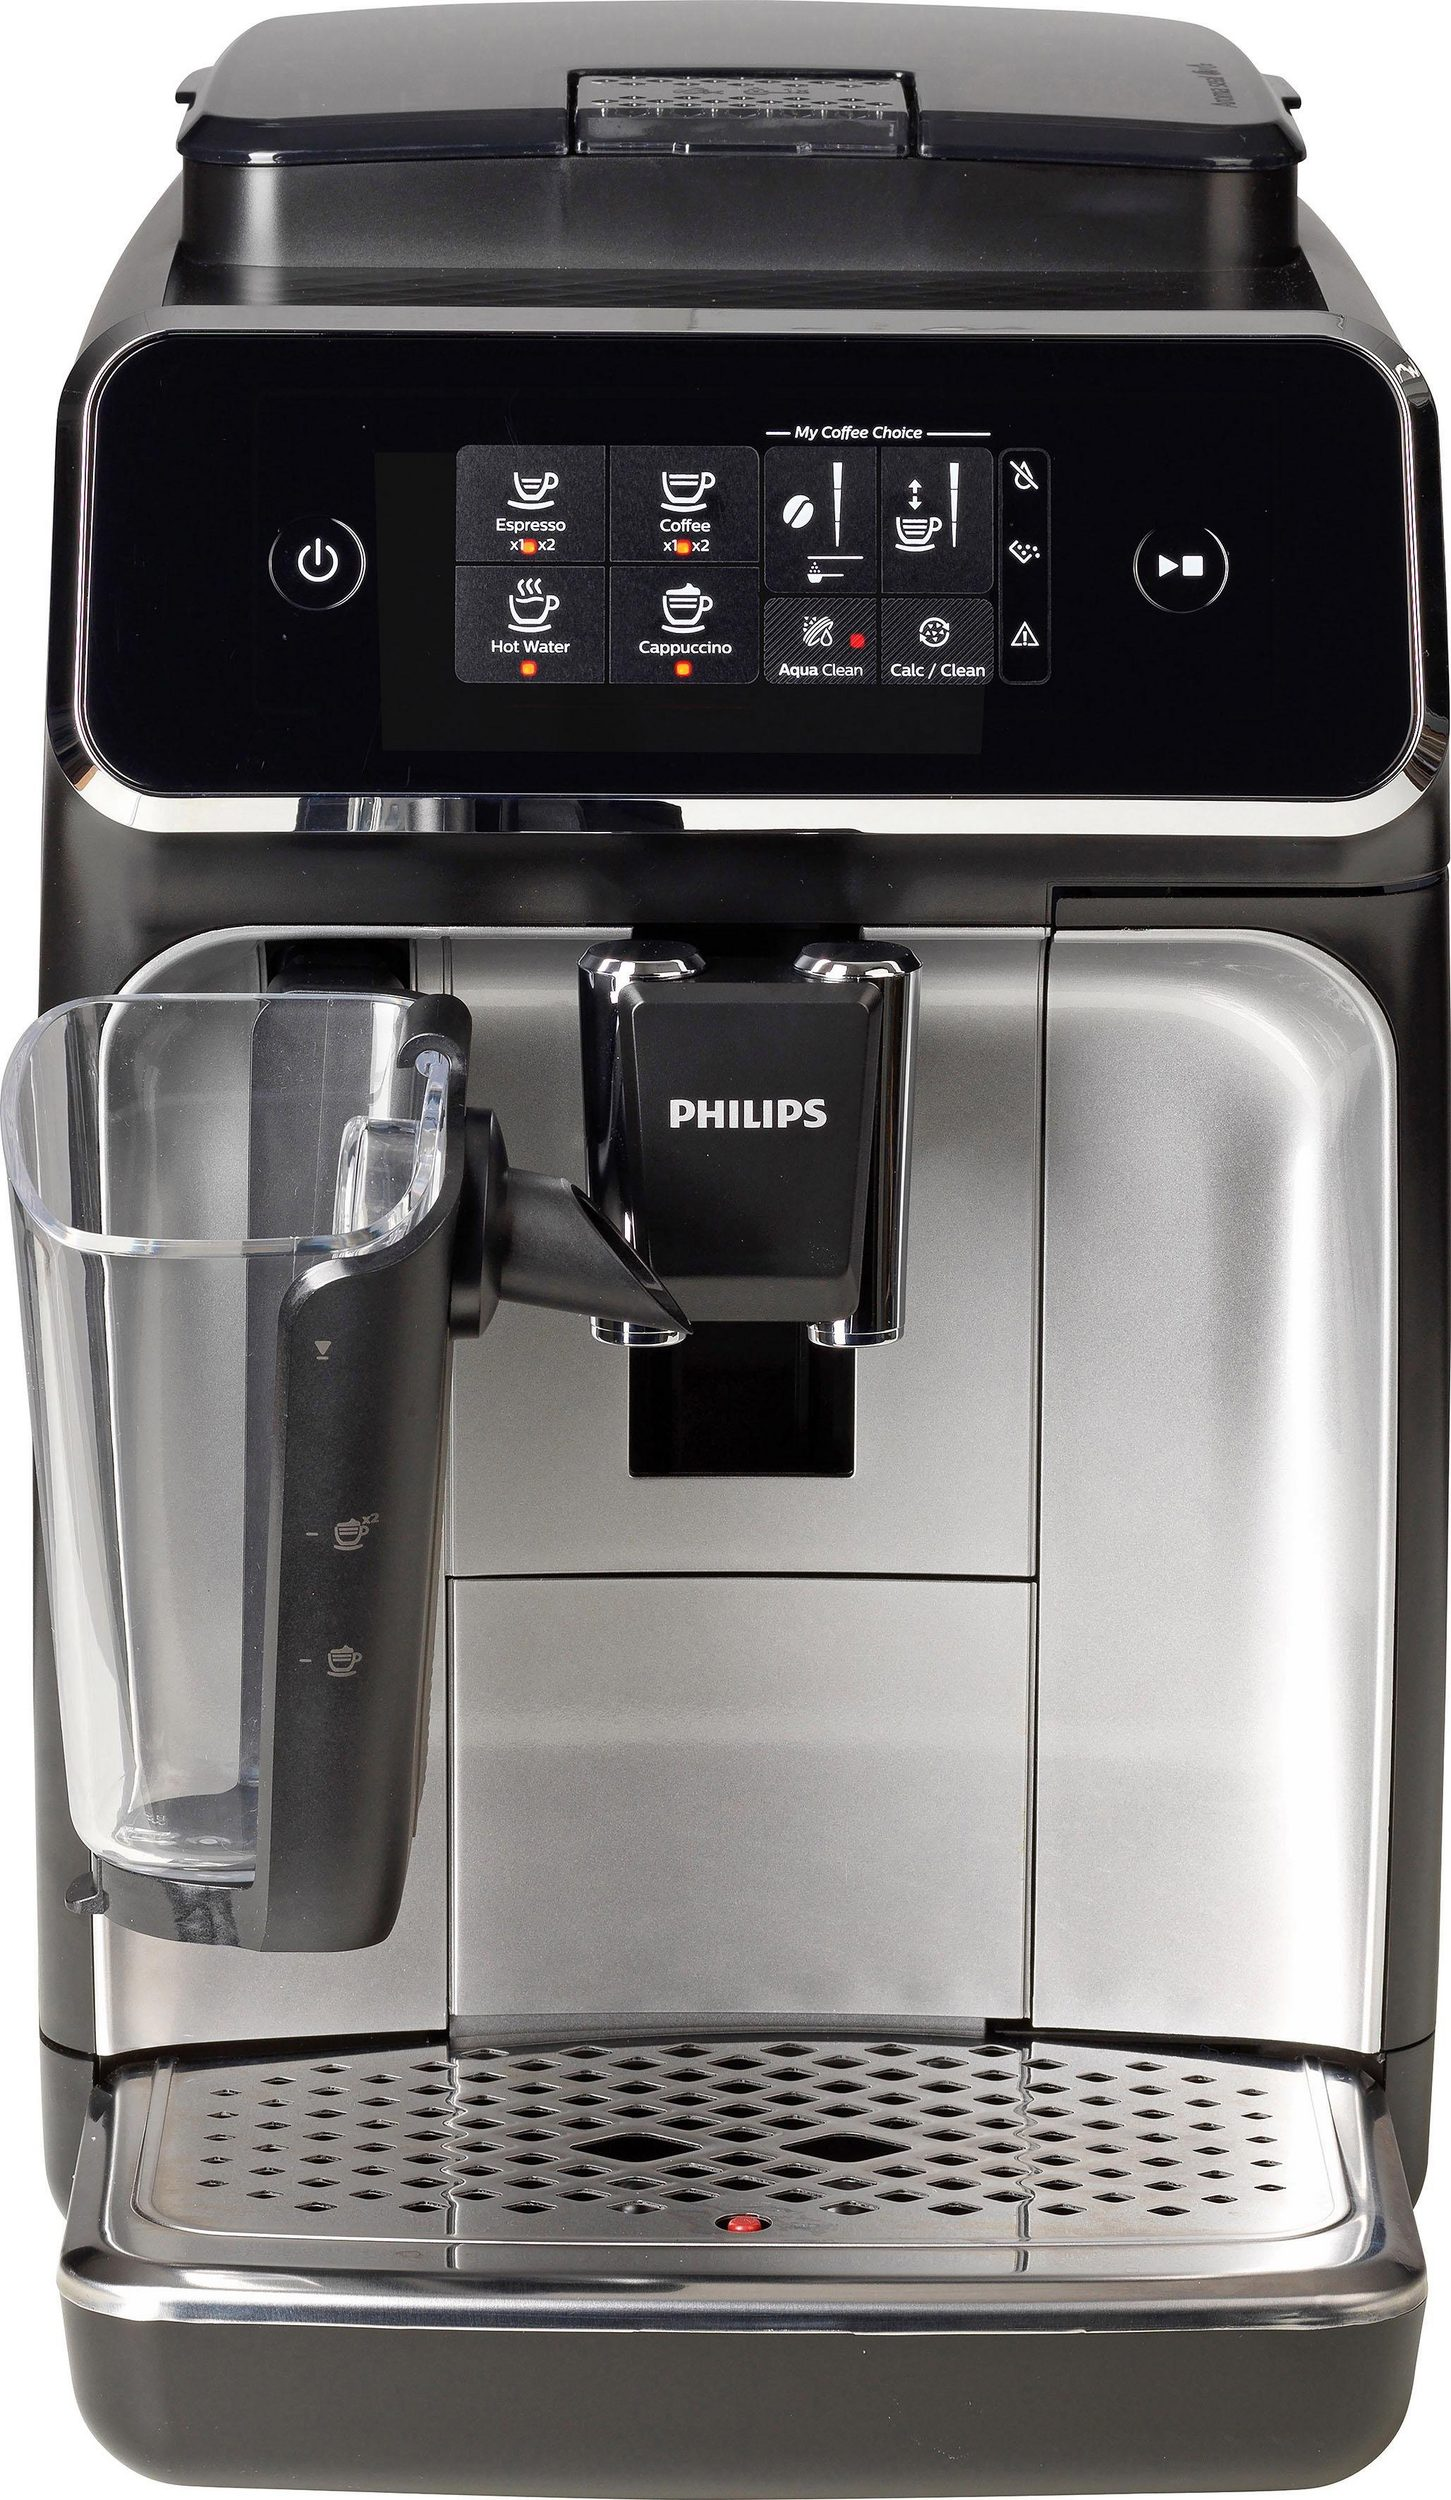 Philips Kaffeevollautomat 2200 Serie EP2236/40 - Philips